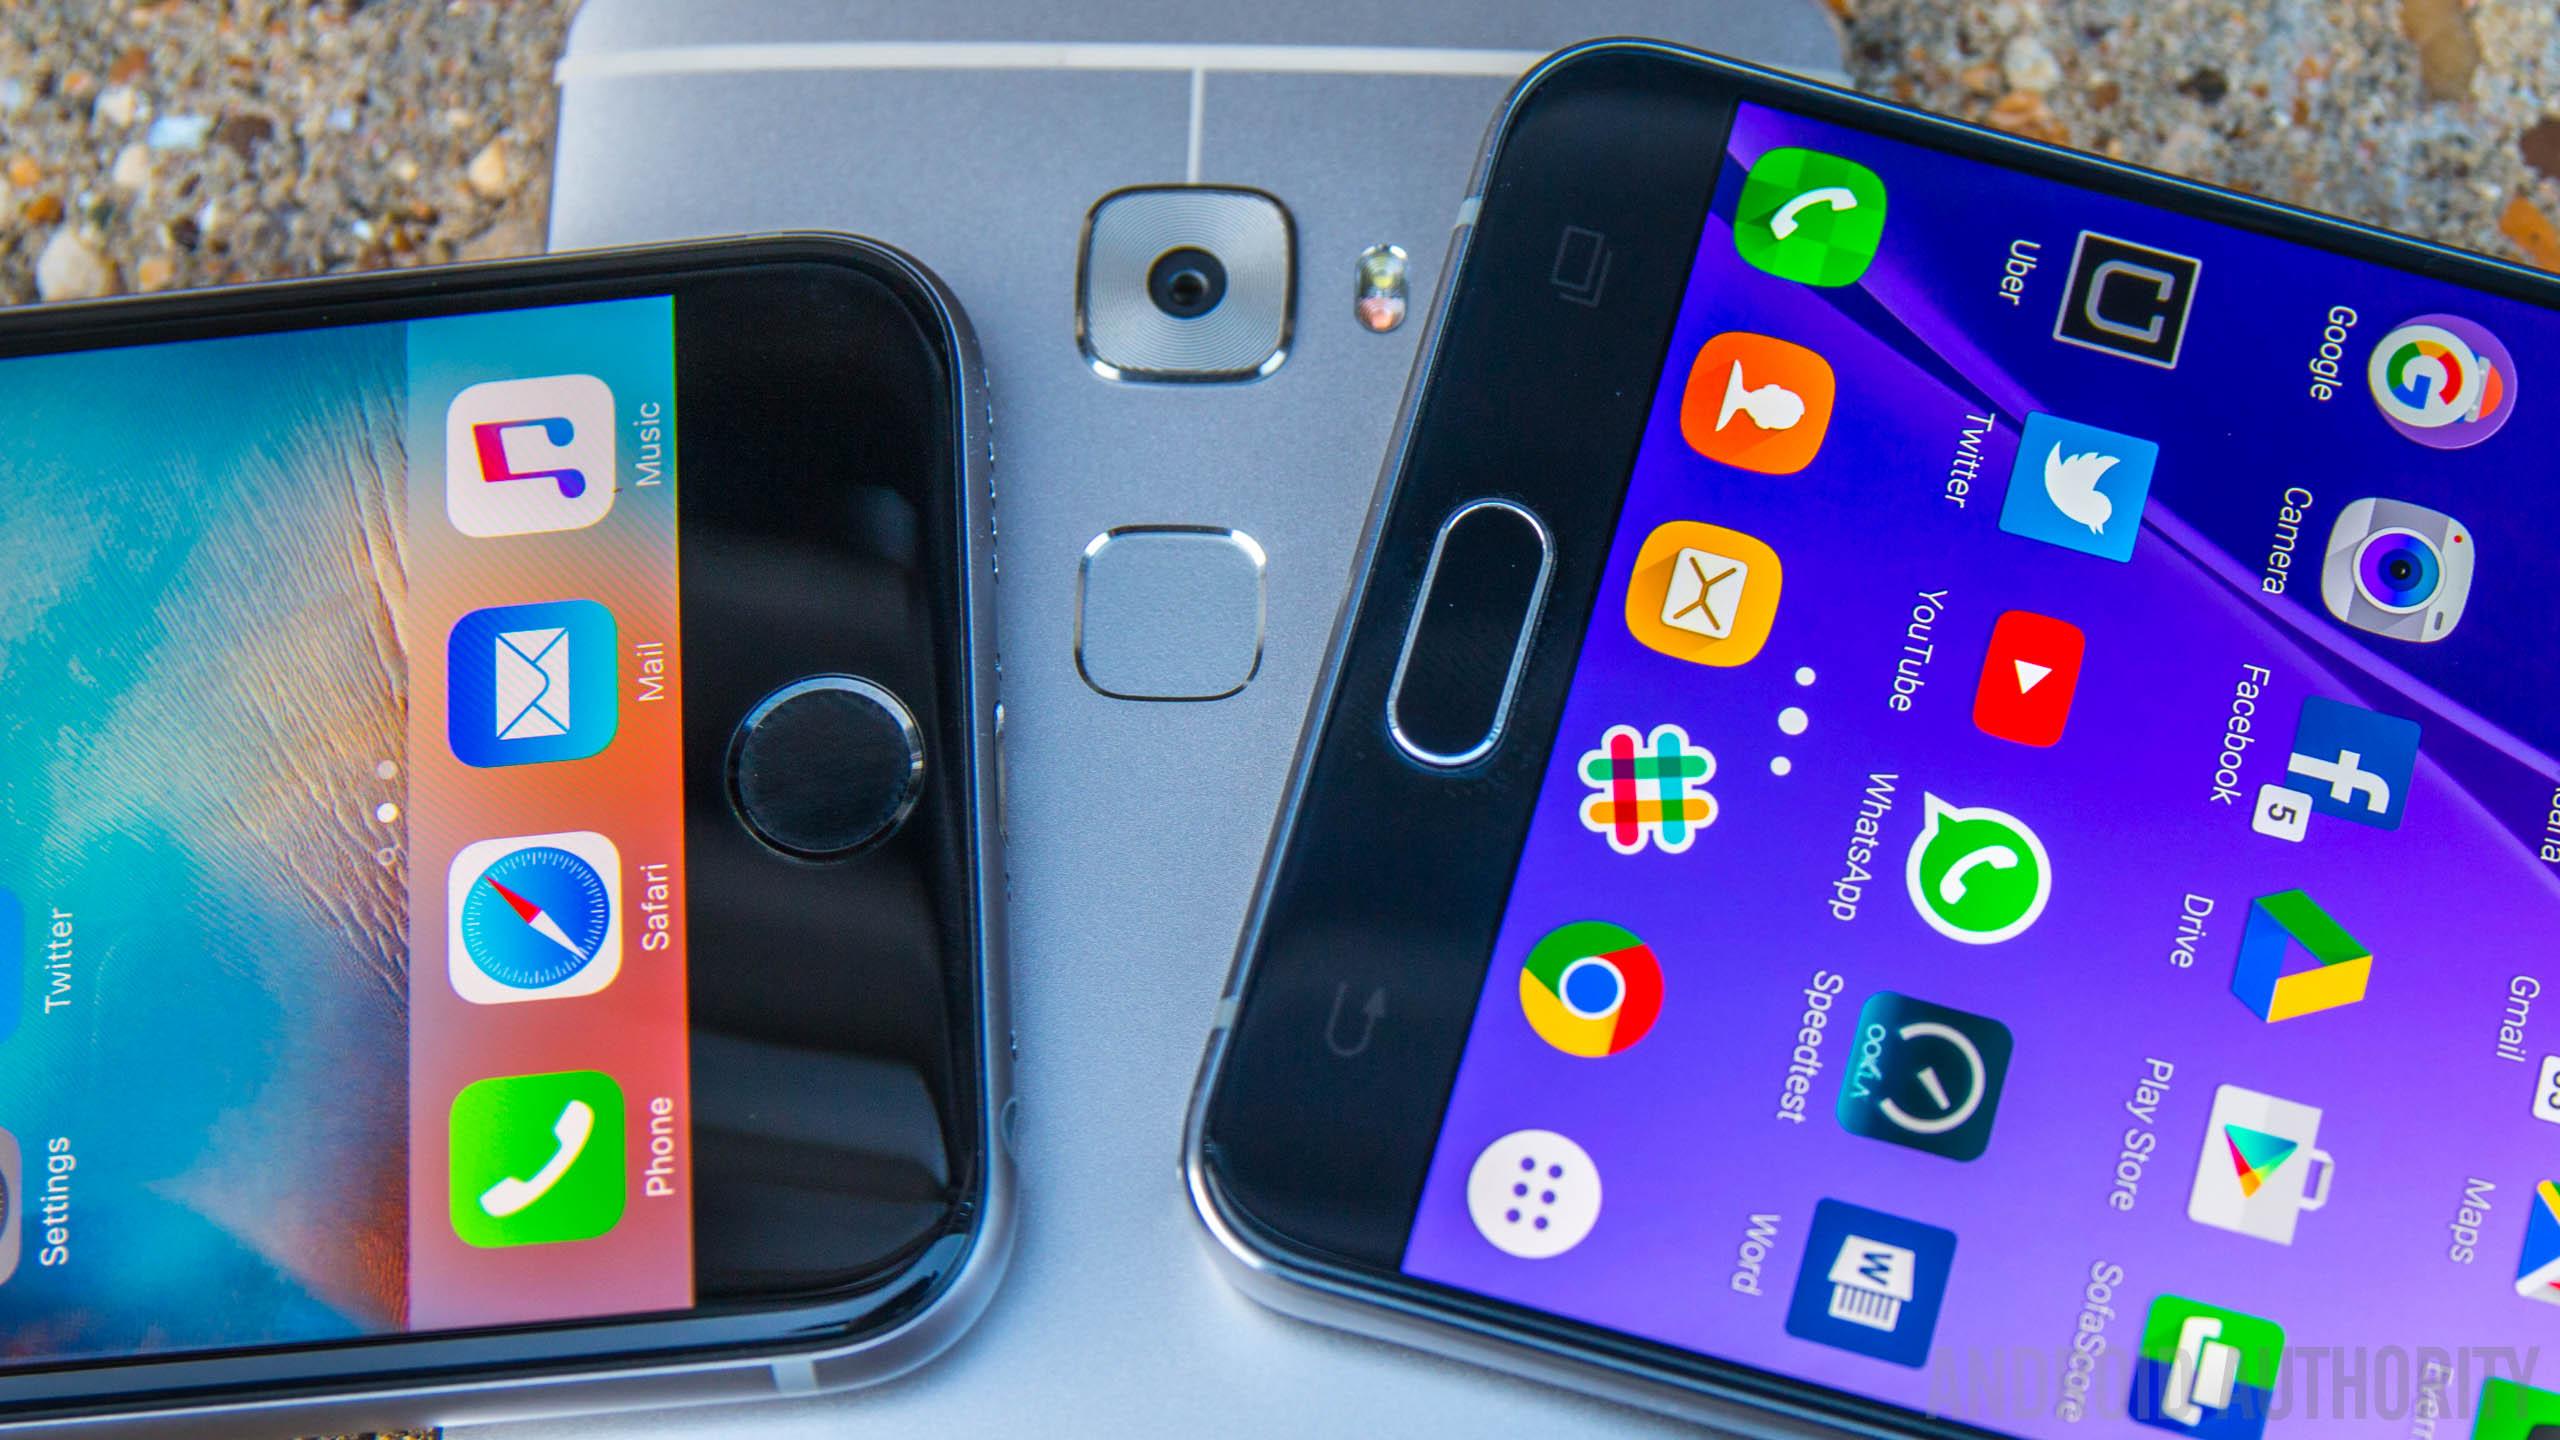 iPhone-6S-Mate-S-Note-5-Fingerprint-Scanner-AA-(6-of-7)